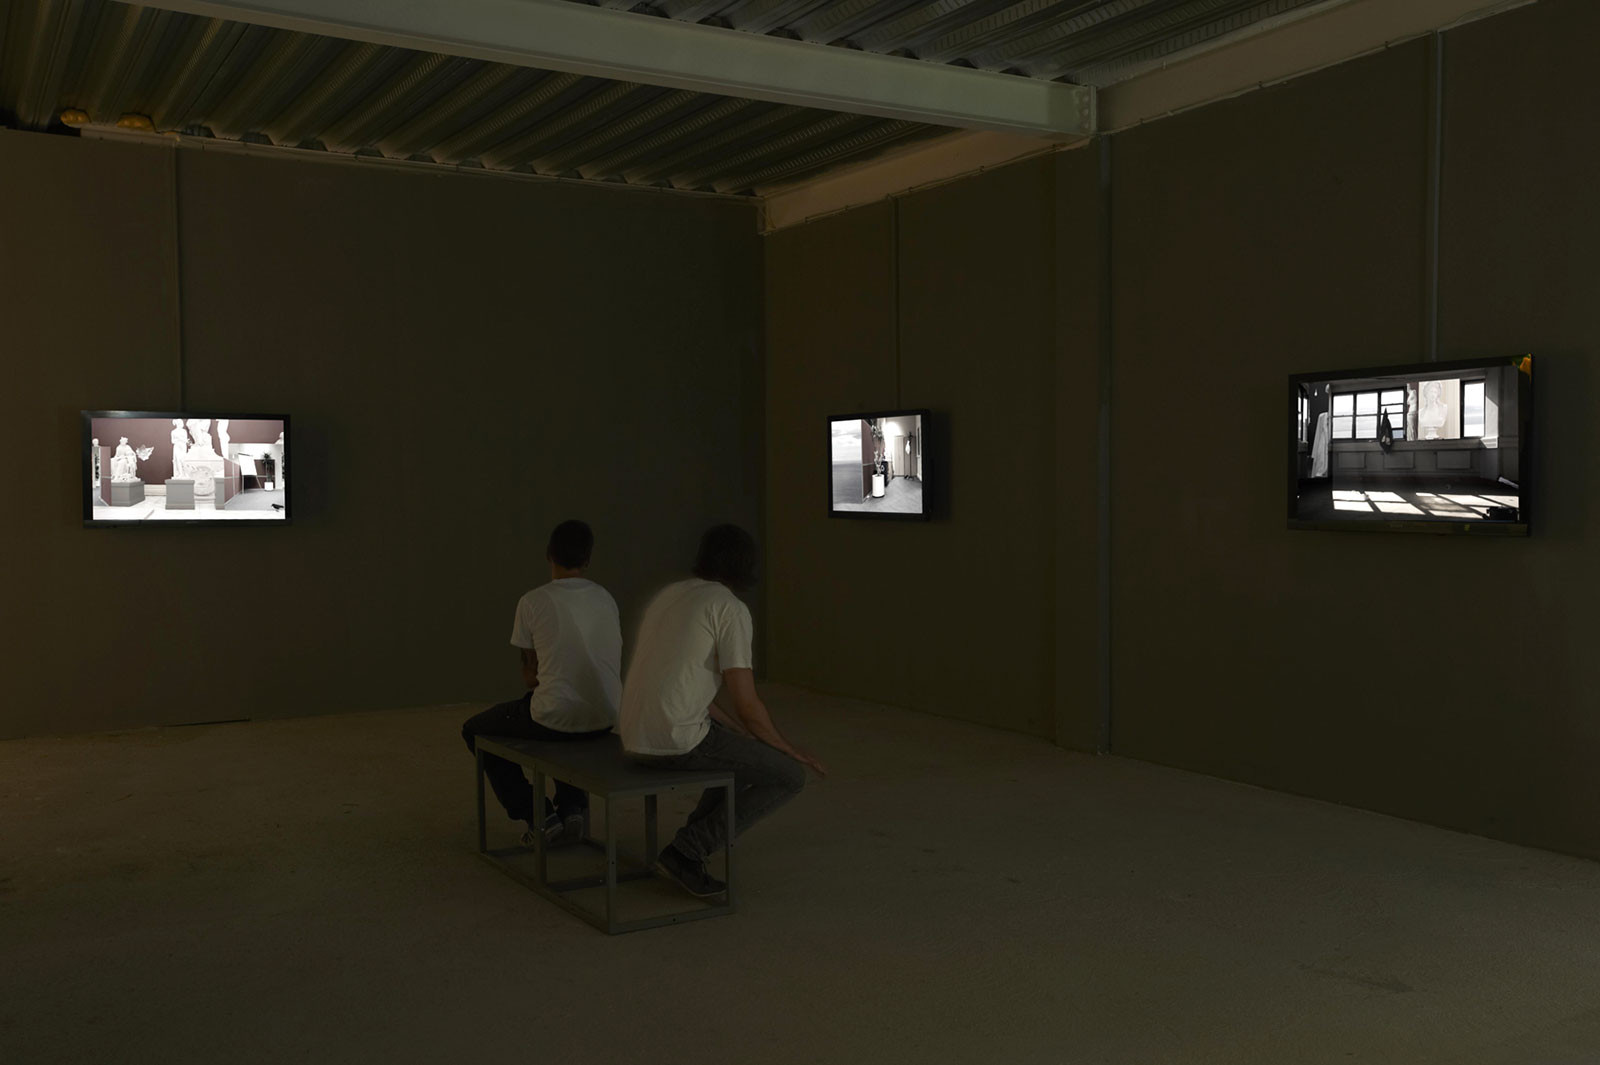 Exhibition view, Eva International, After the Future, Limerick, Ireland, 2012